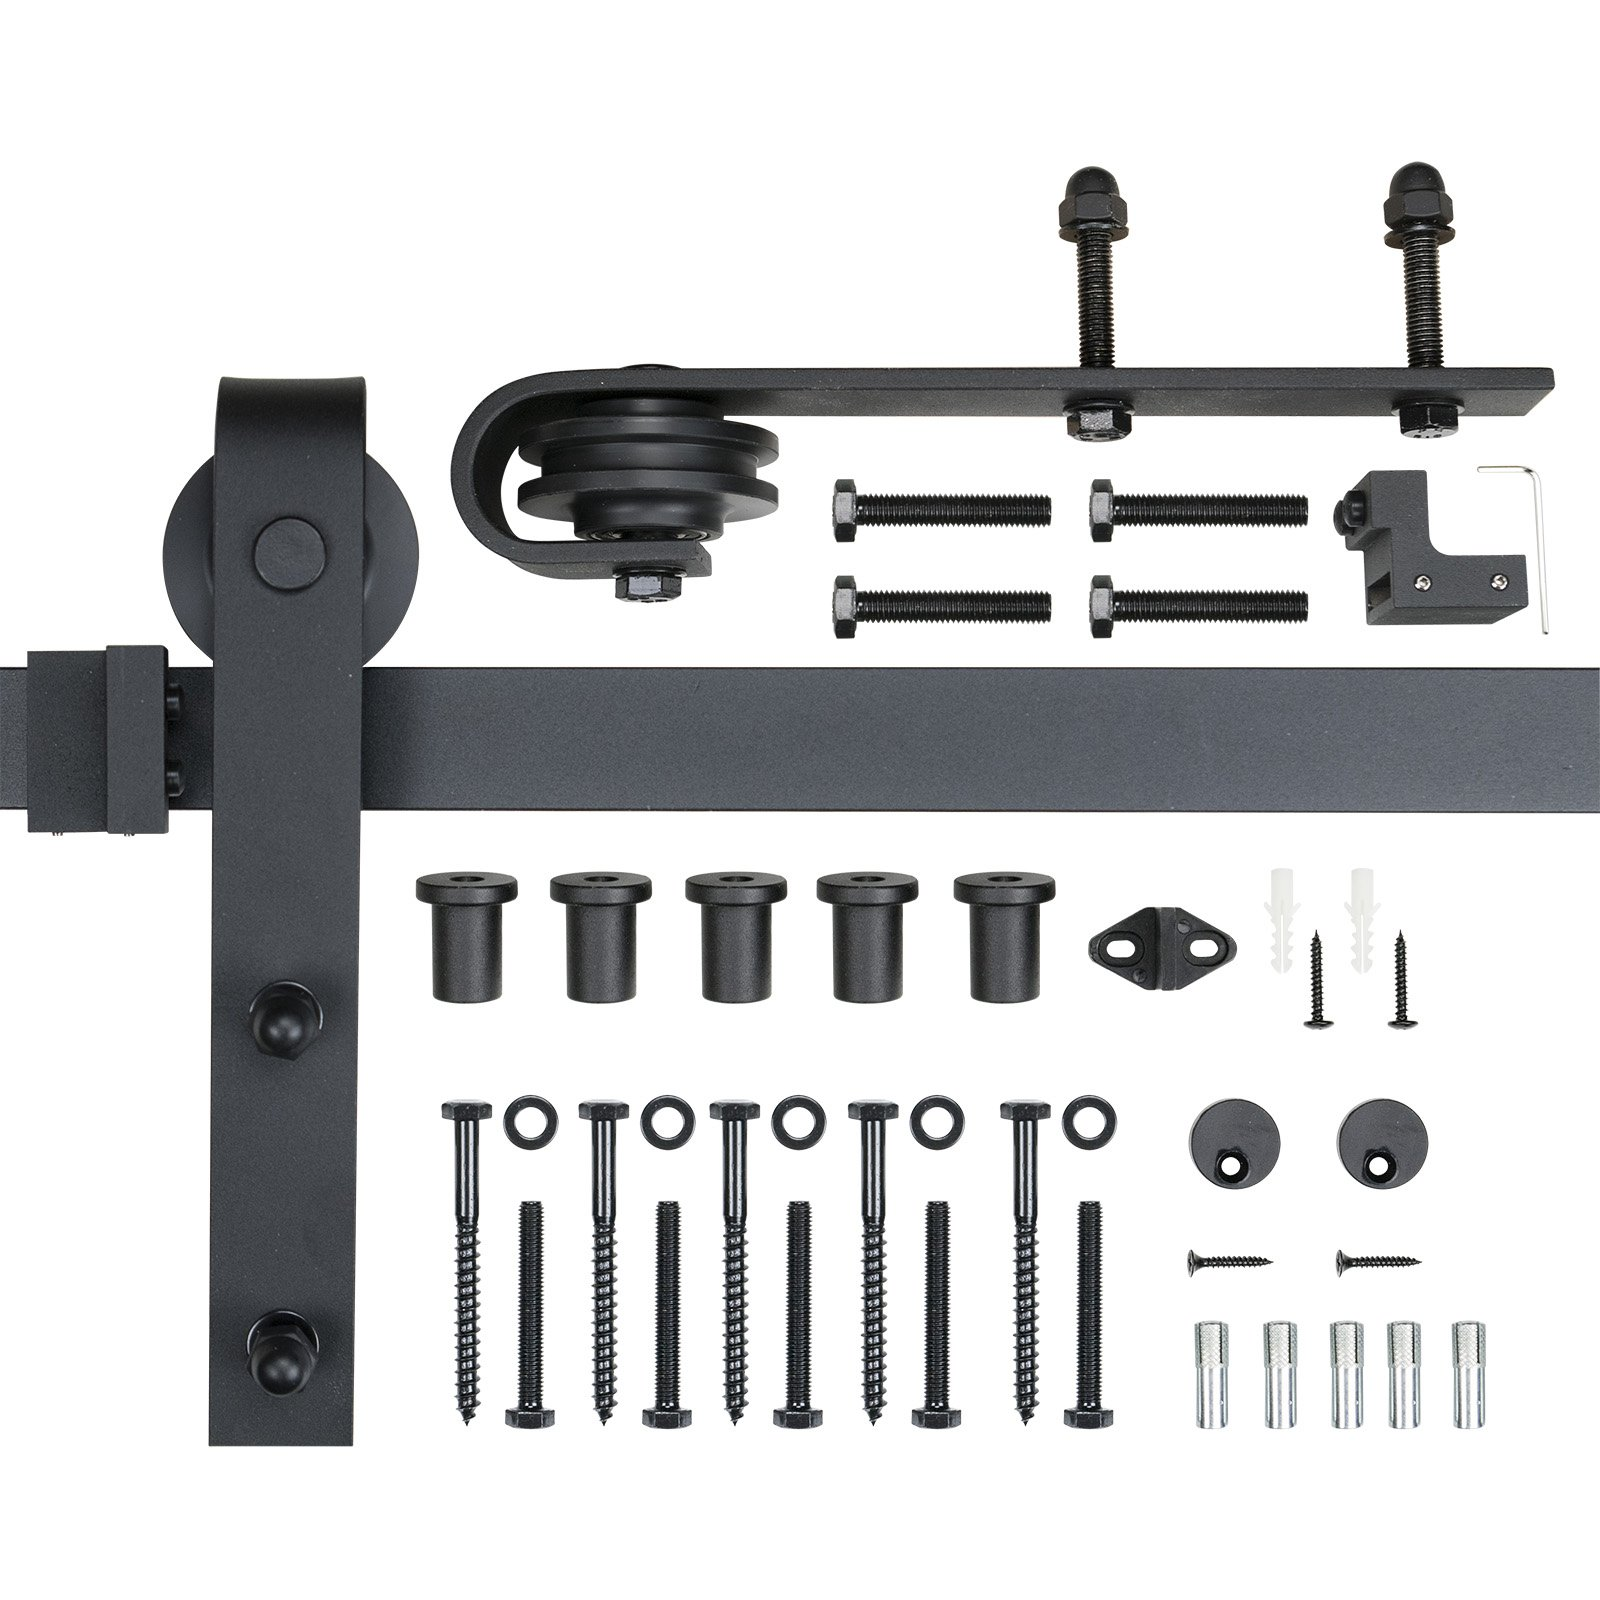 POWERTEC BDR1001 6-Foot Heavy Duty Barn Door Hardware Kit, Black, 100,000 Rolls Tested, One-Piece Rail